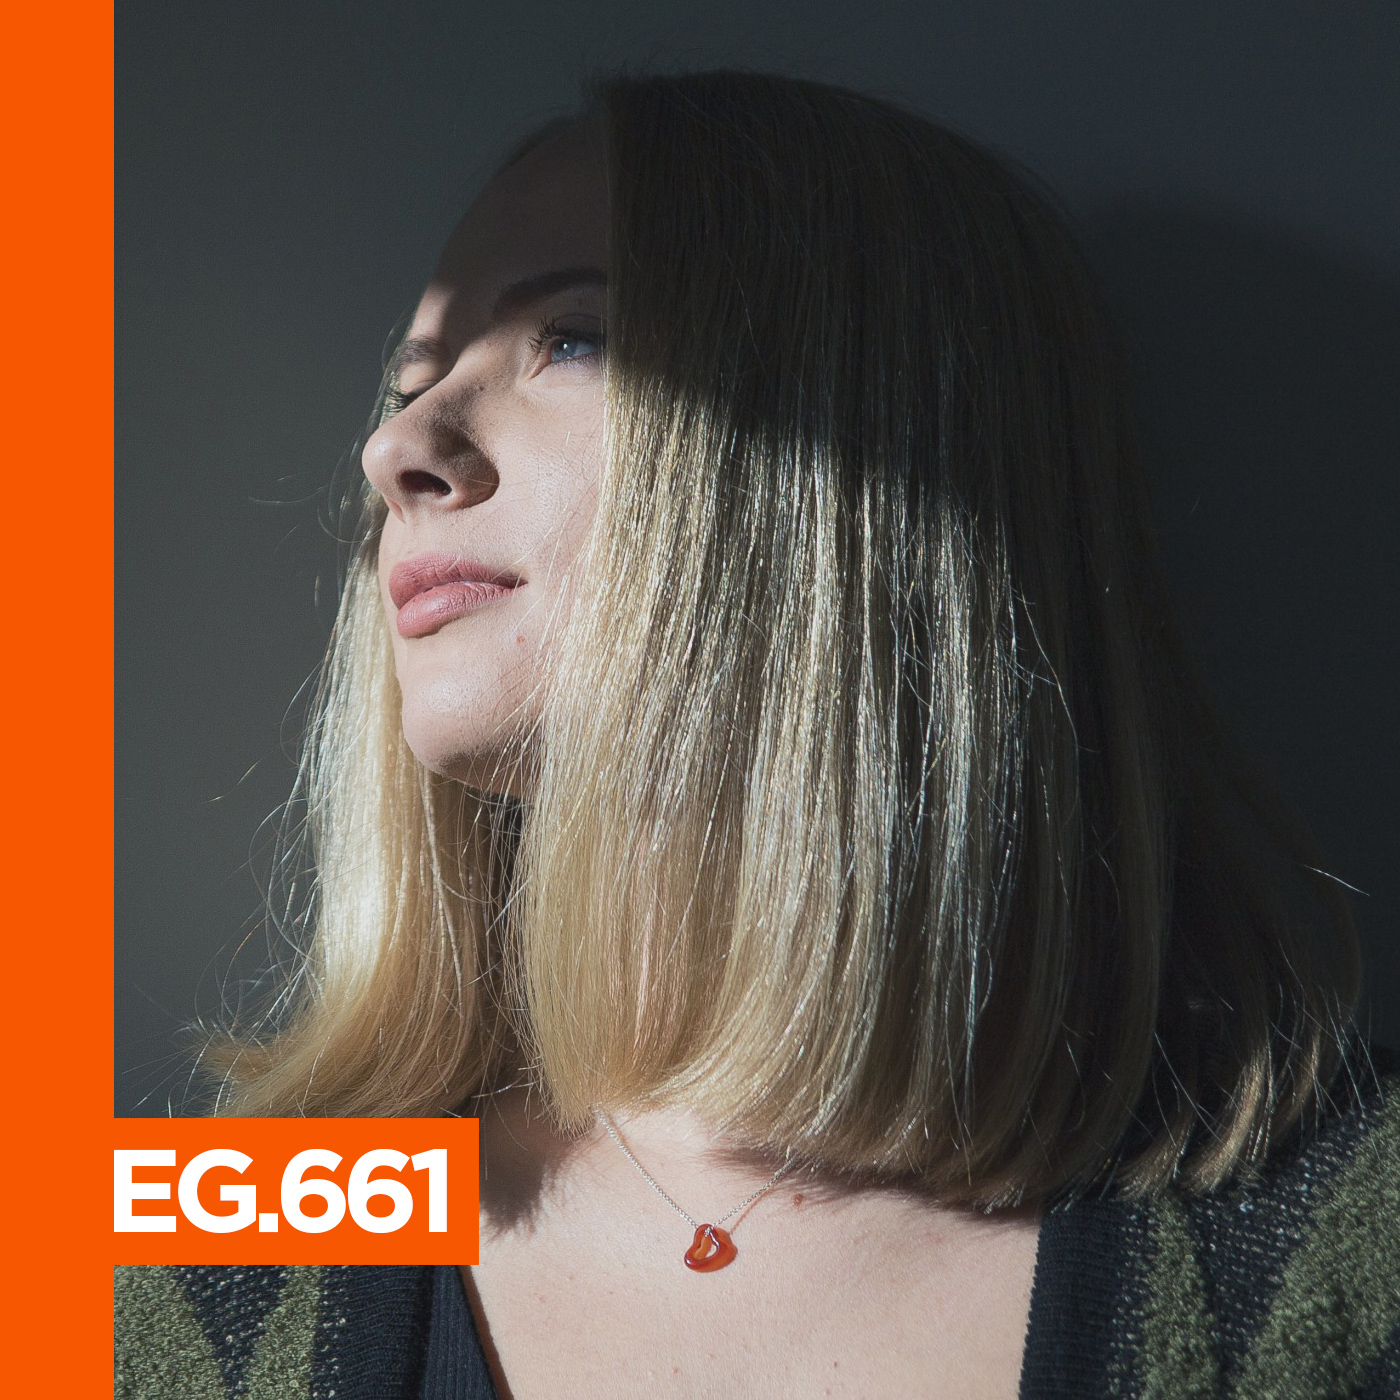 EG.661 Yulia Niko